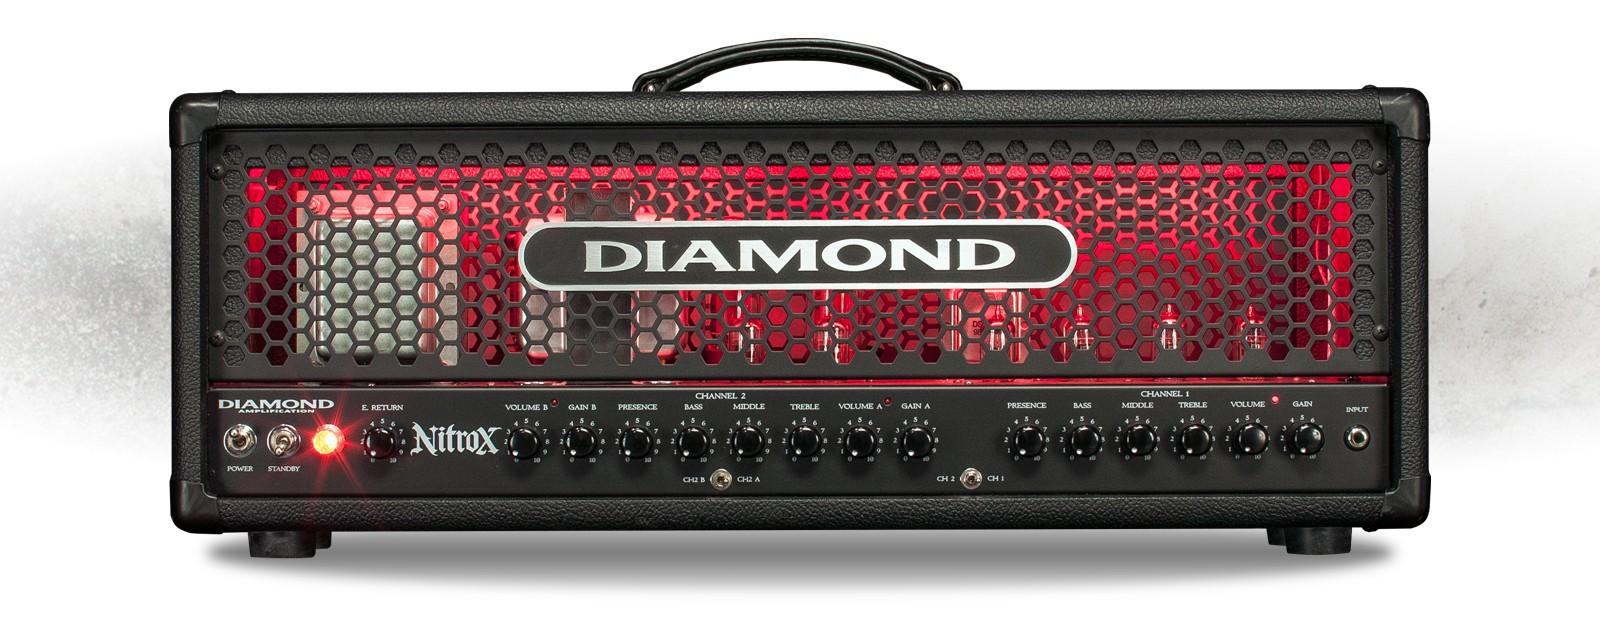 diamond nitrox 100w usa modern tube amplifier head the axe palace rh axepalace com